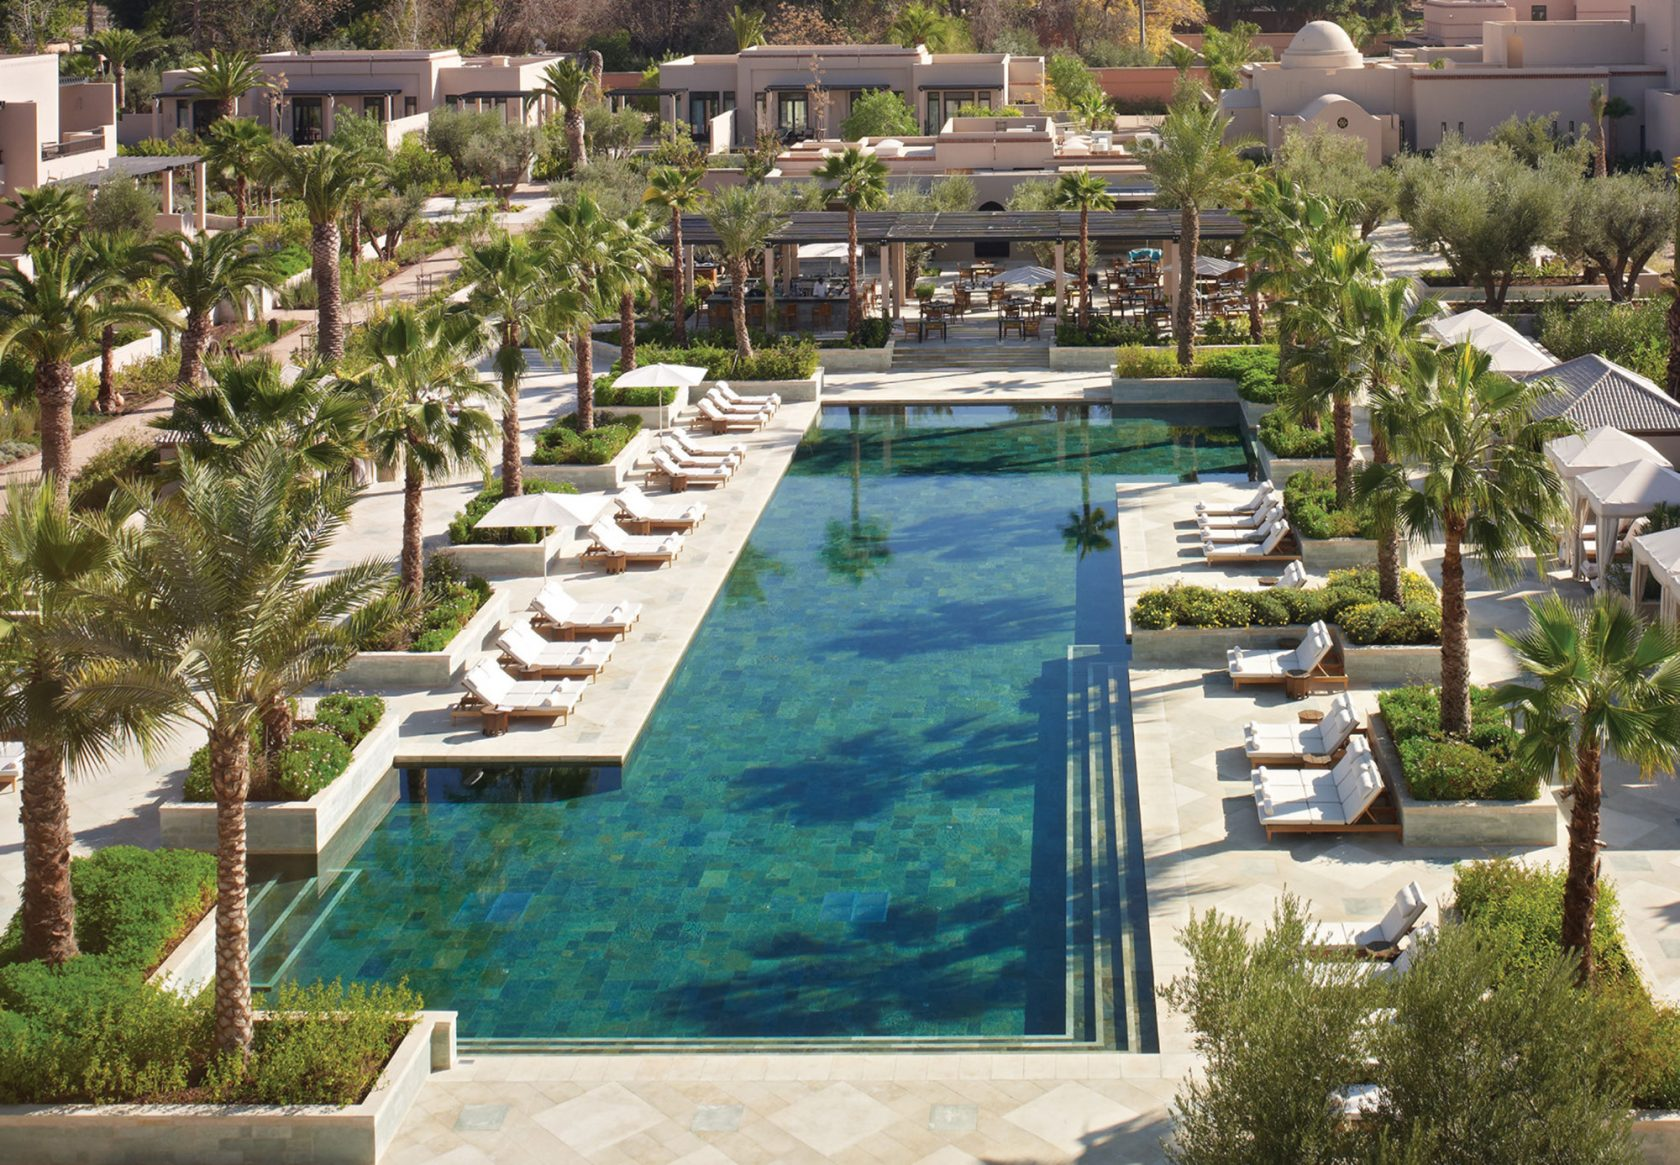 Four Seasons Marrakesch Pool area